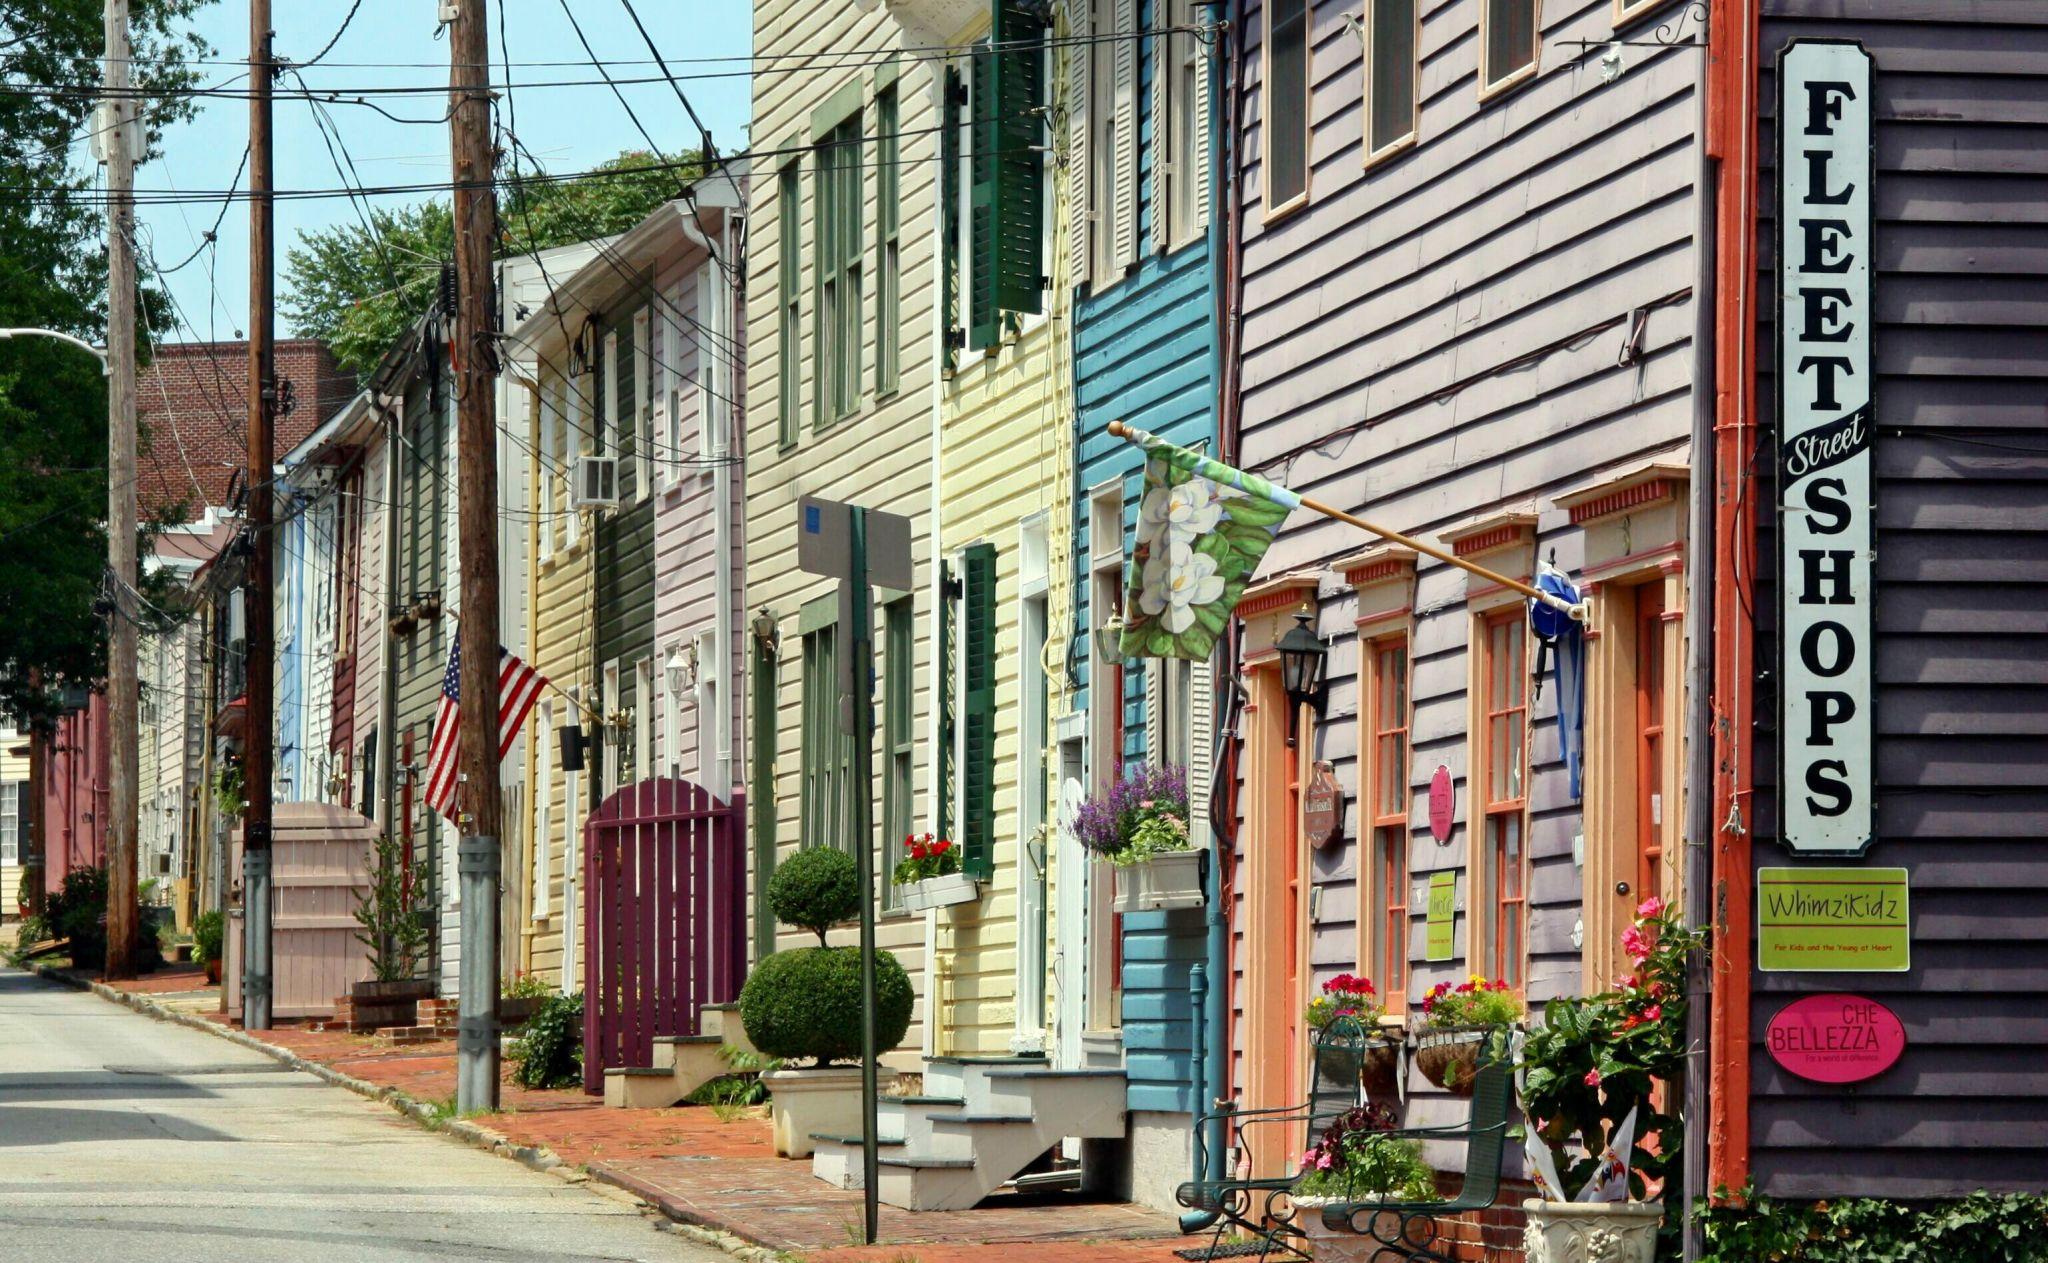 Fleetstreet, Annapolis, Maryland, USA